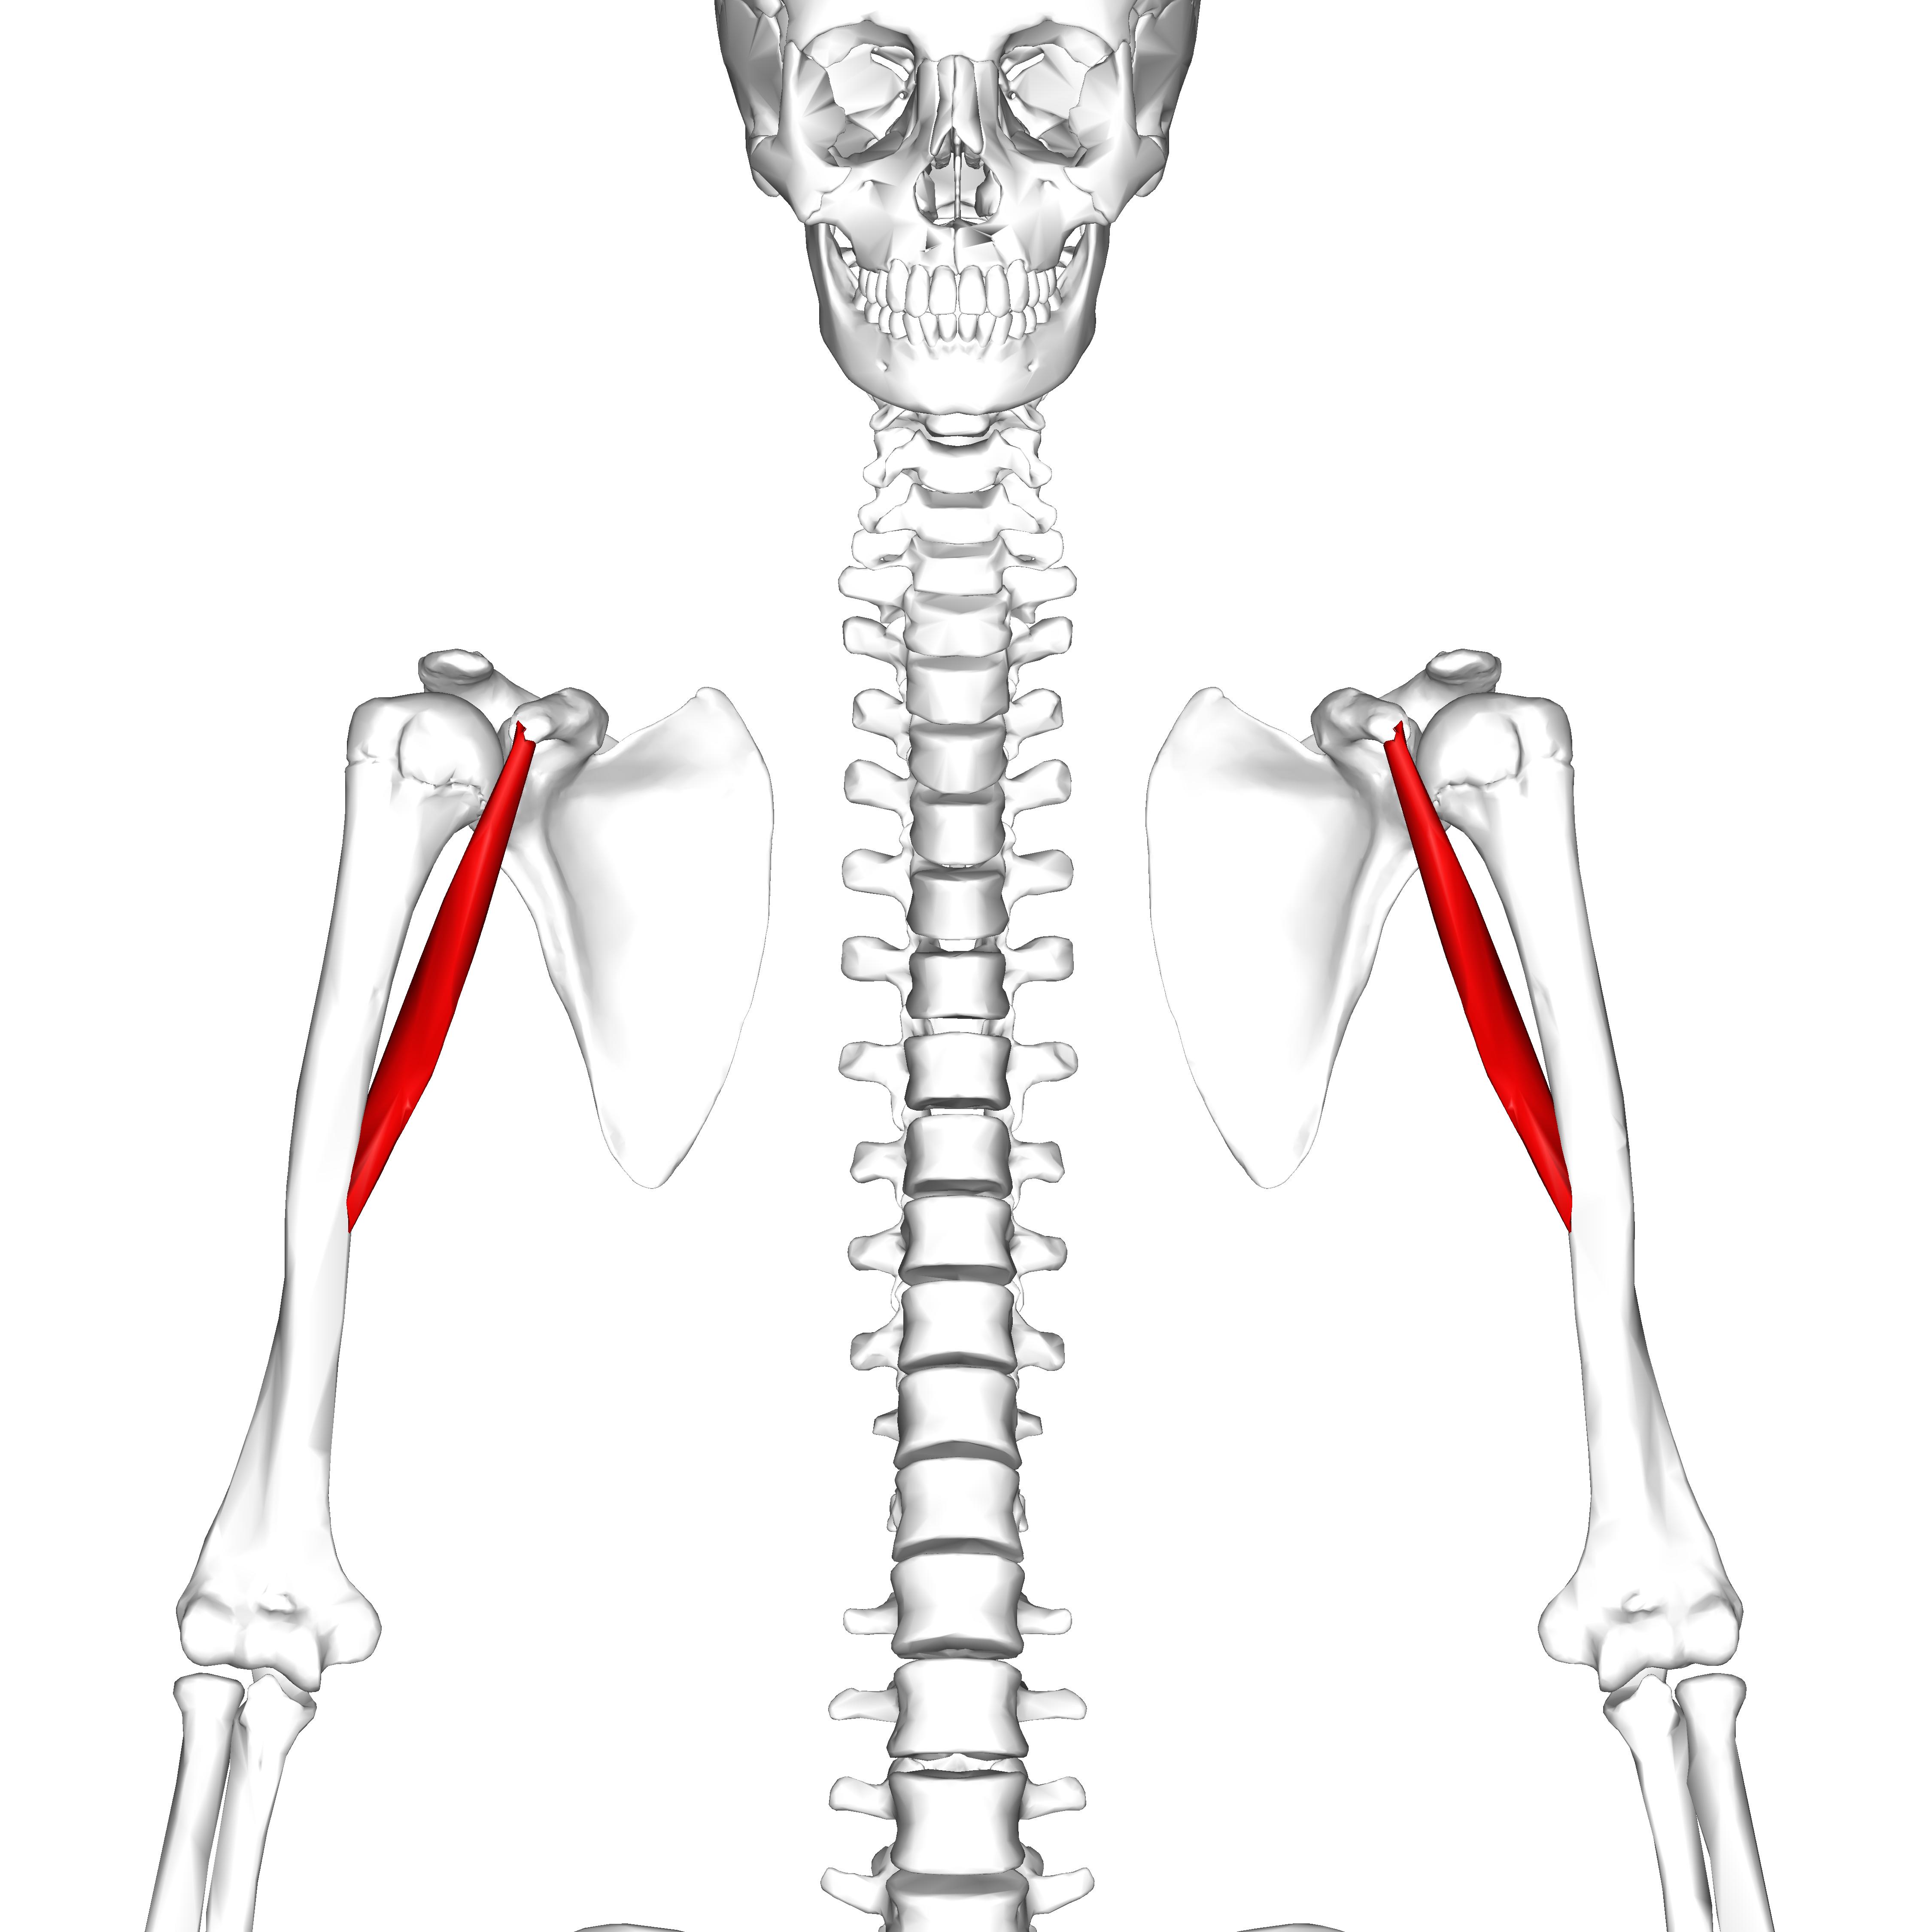 File:Coracobrachialis muscle10.png